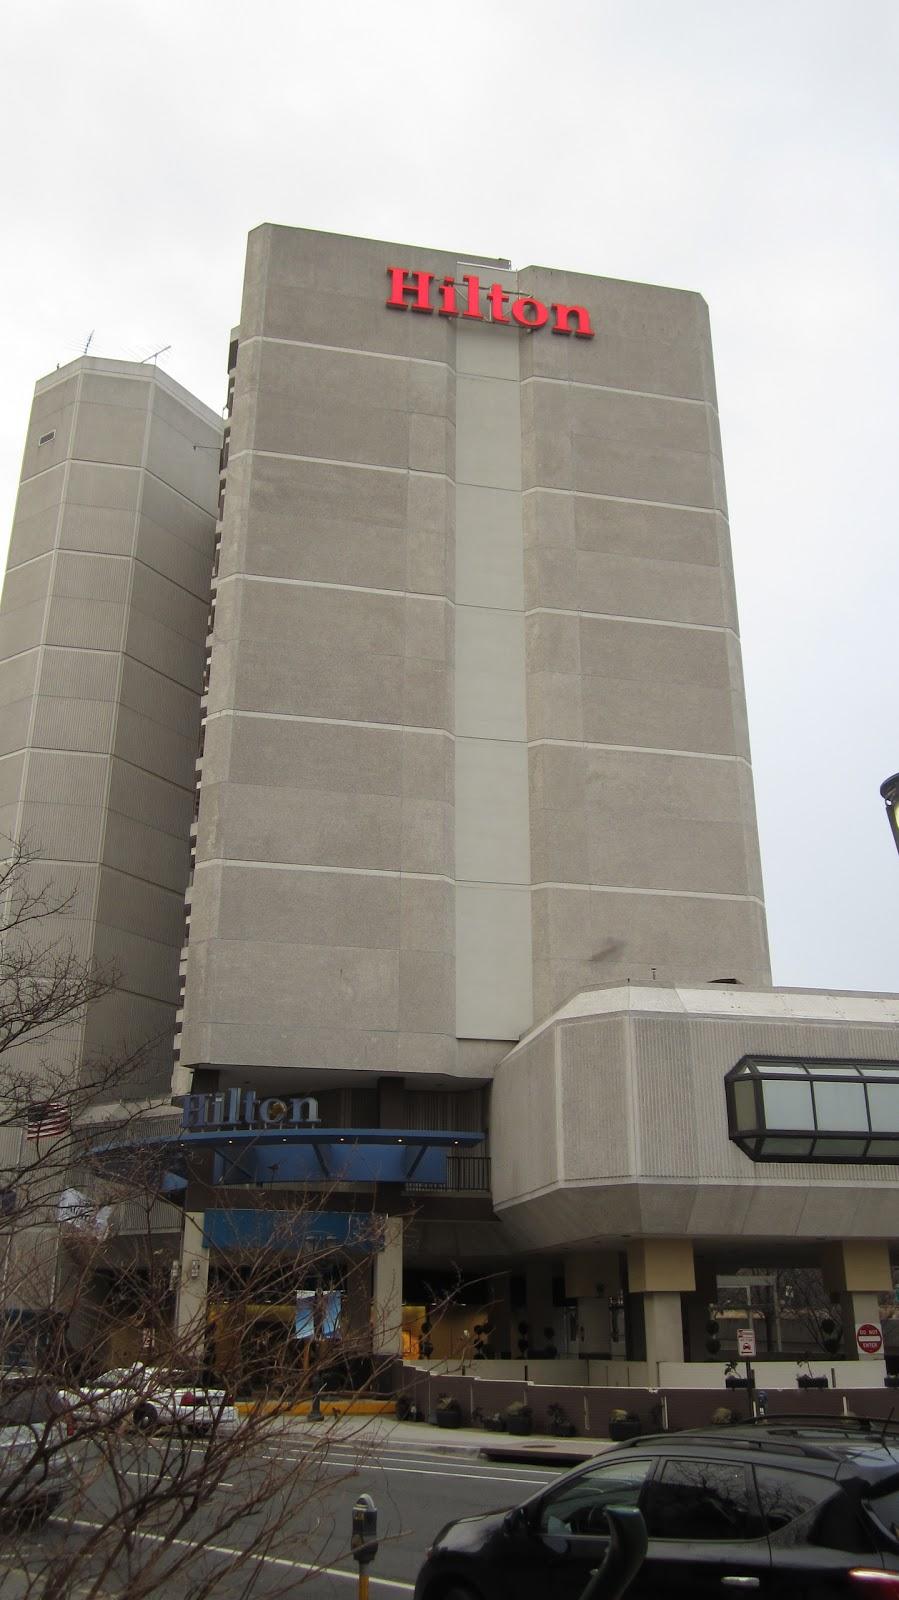 Hilton Crystal City AKA DCA Hilton